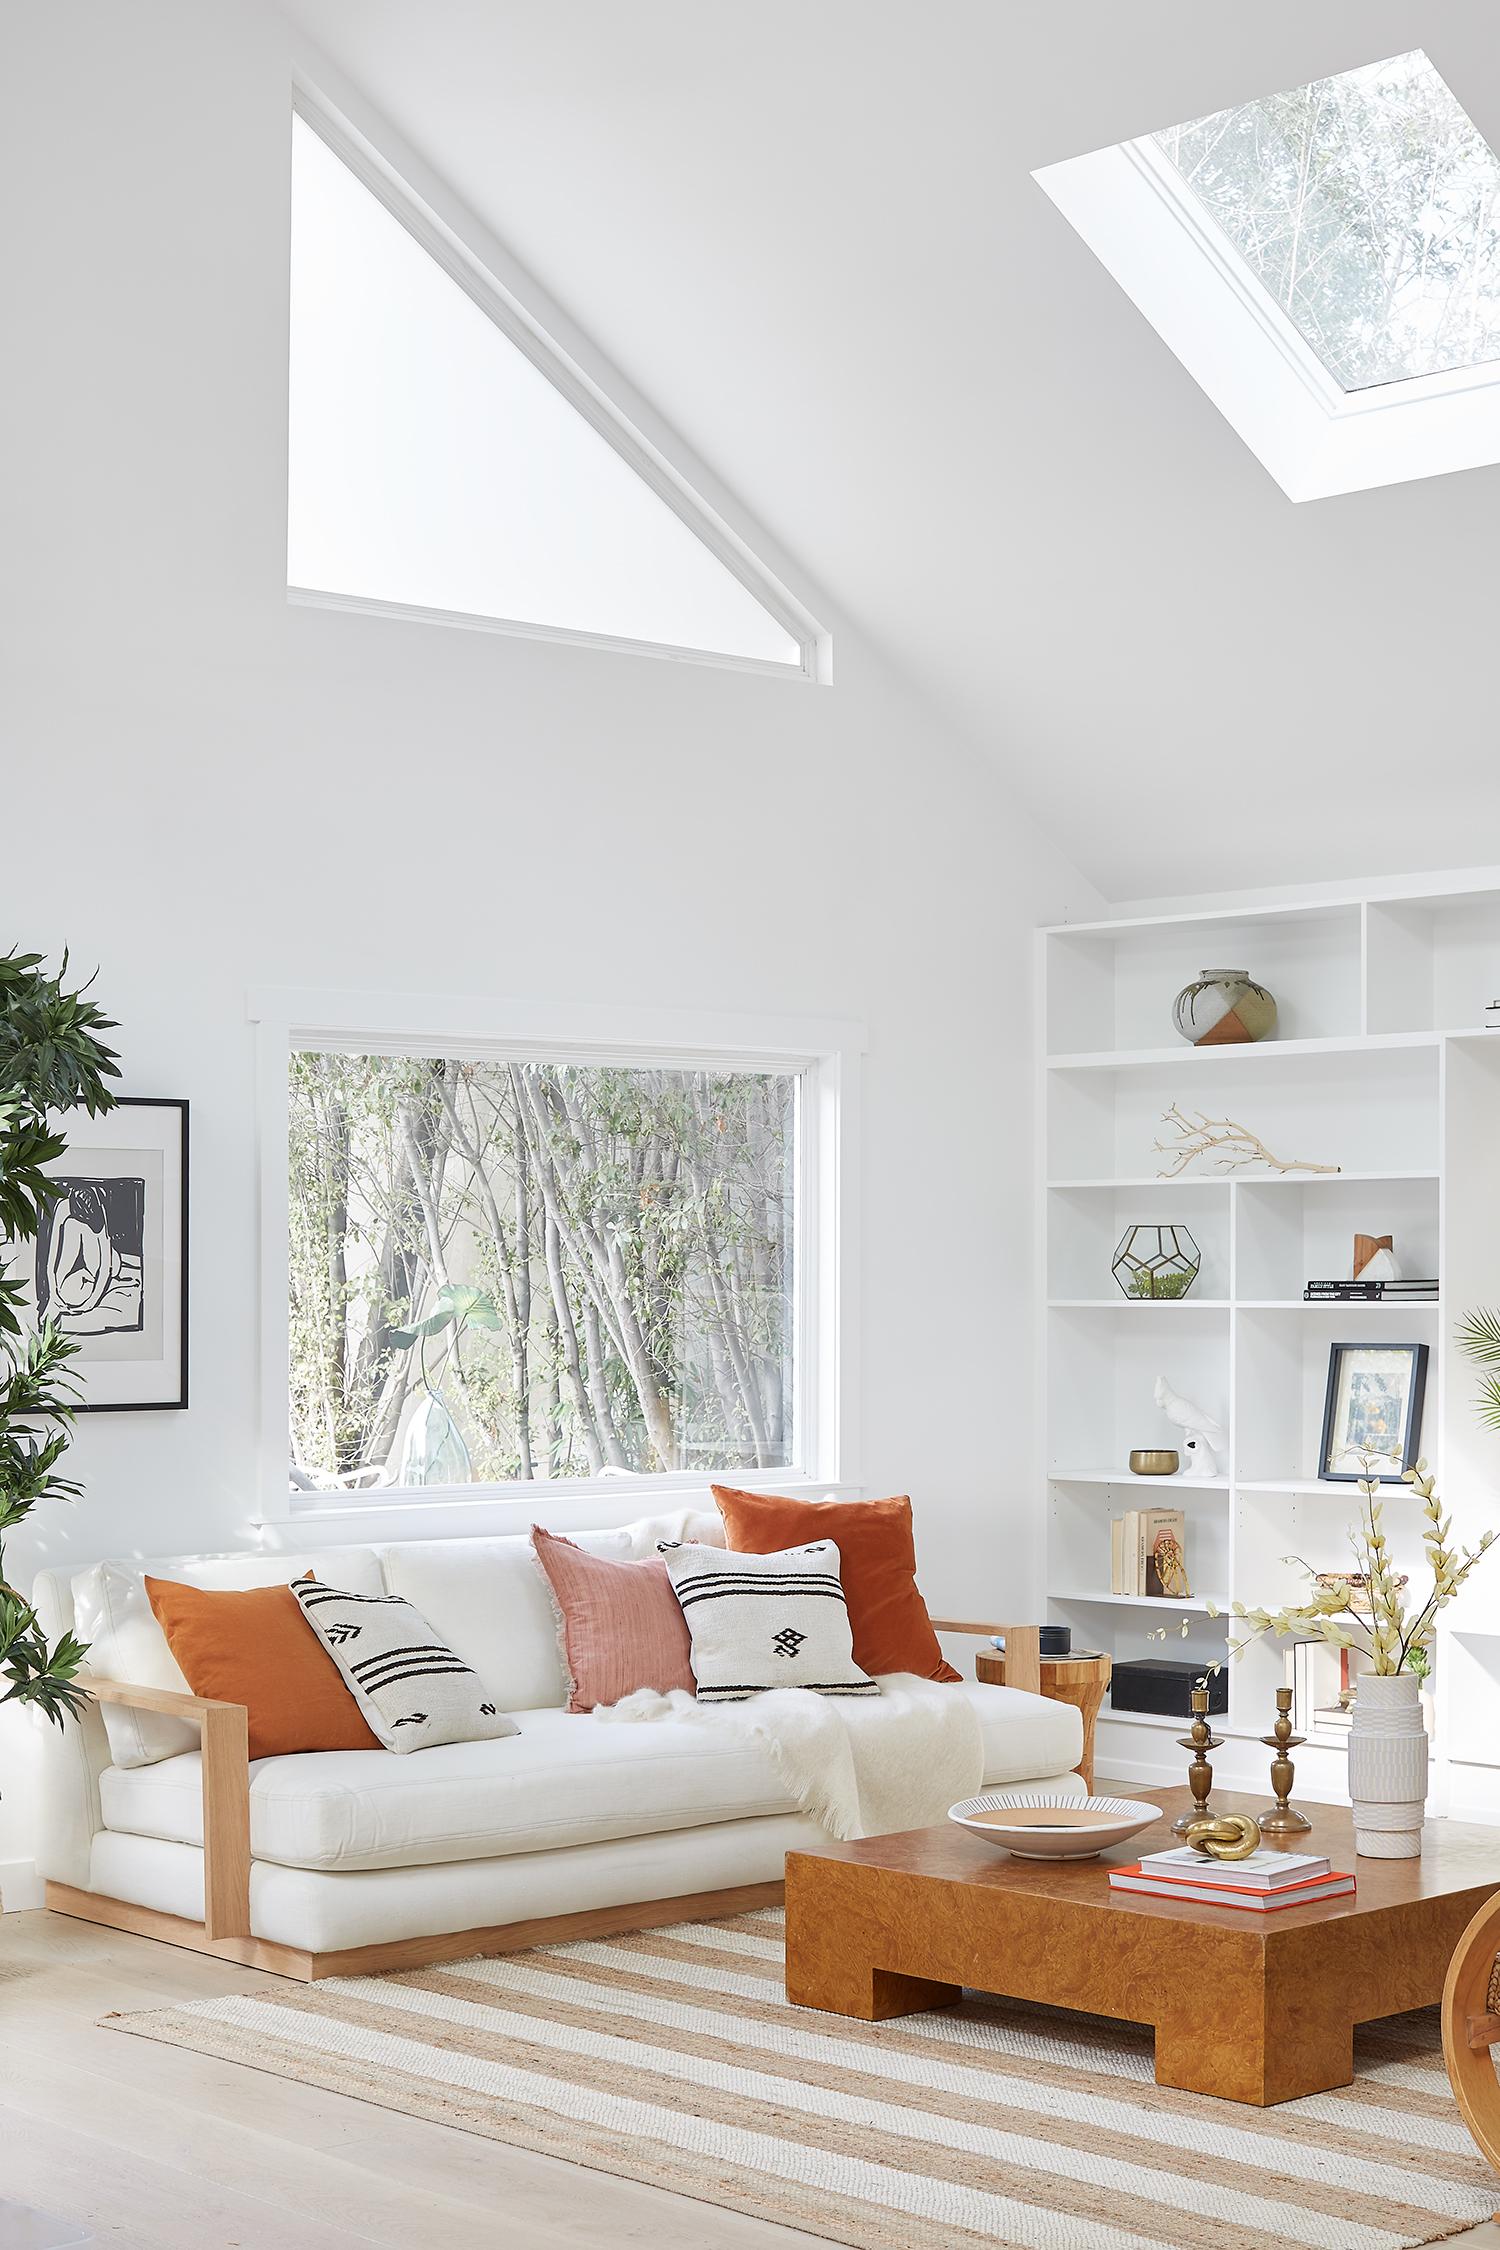 Interior Design by The Platform Experiment